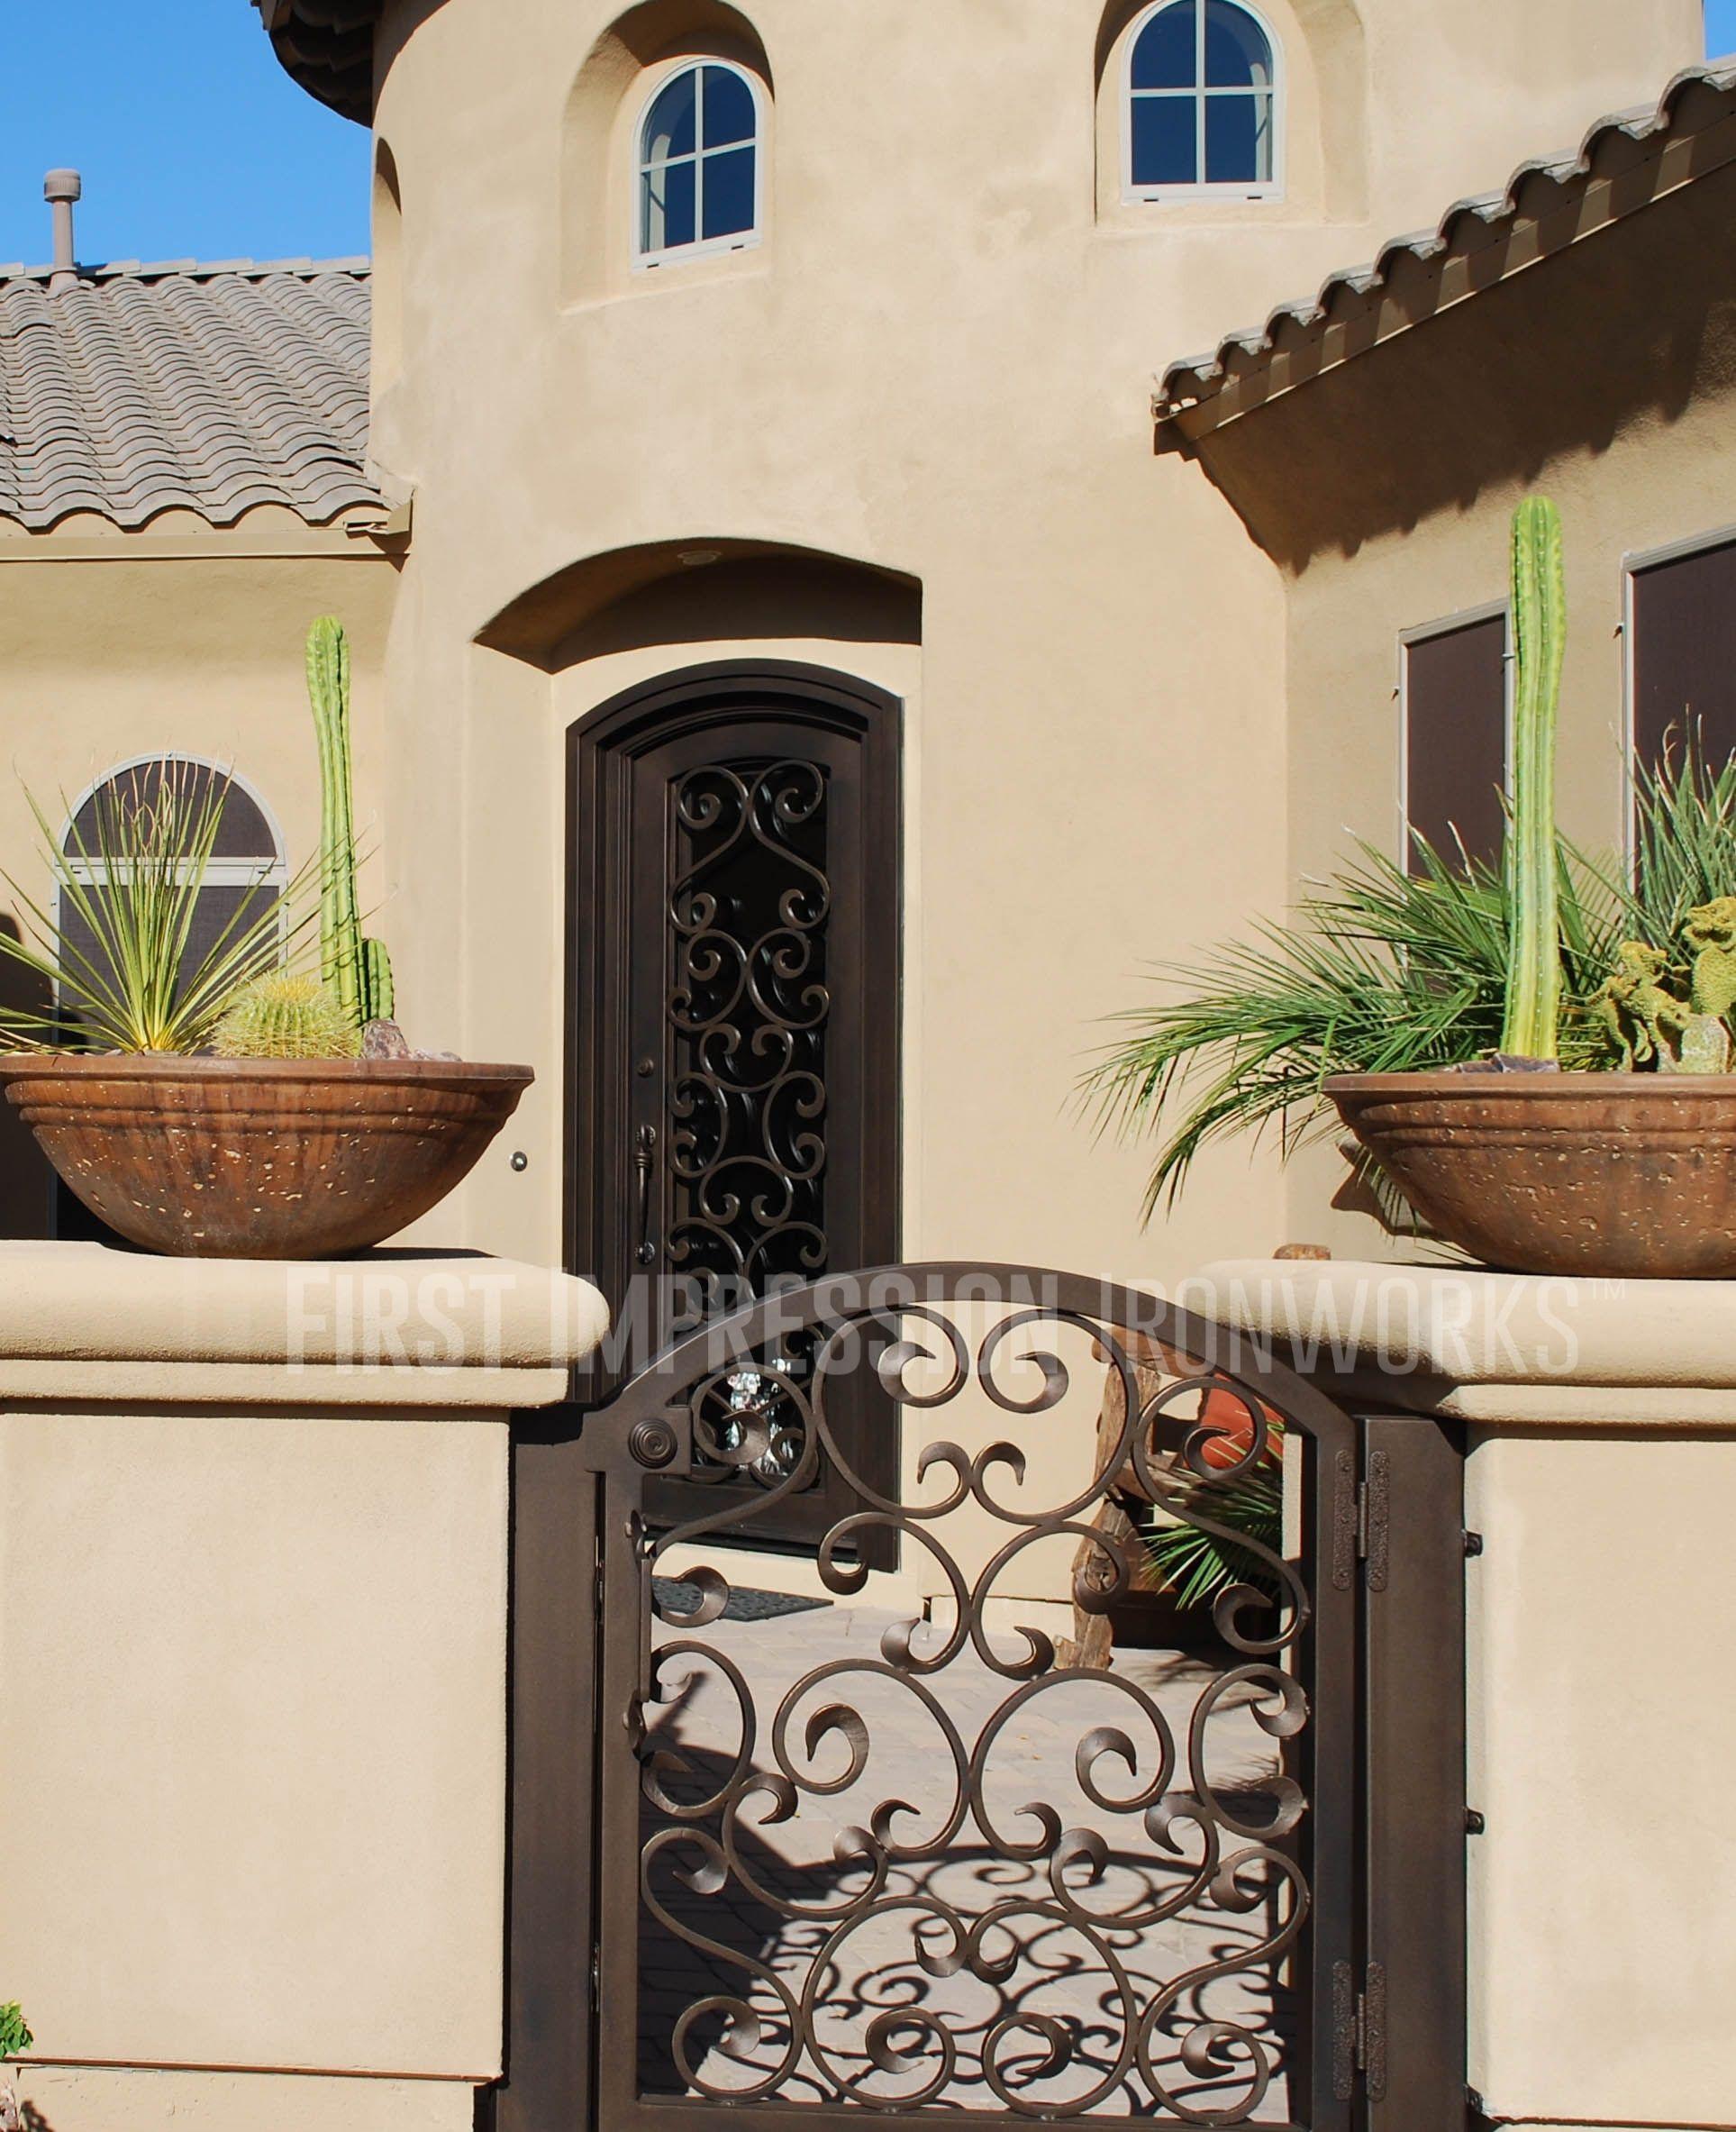 First Impression Ironworks front door u0026 matching exterior gate #ornamentaliron #frontdoor #irondoor # & First Impression Ironworks front door u0026 matching exterior gate ...